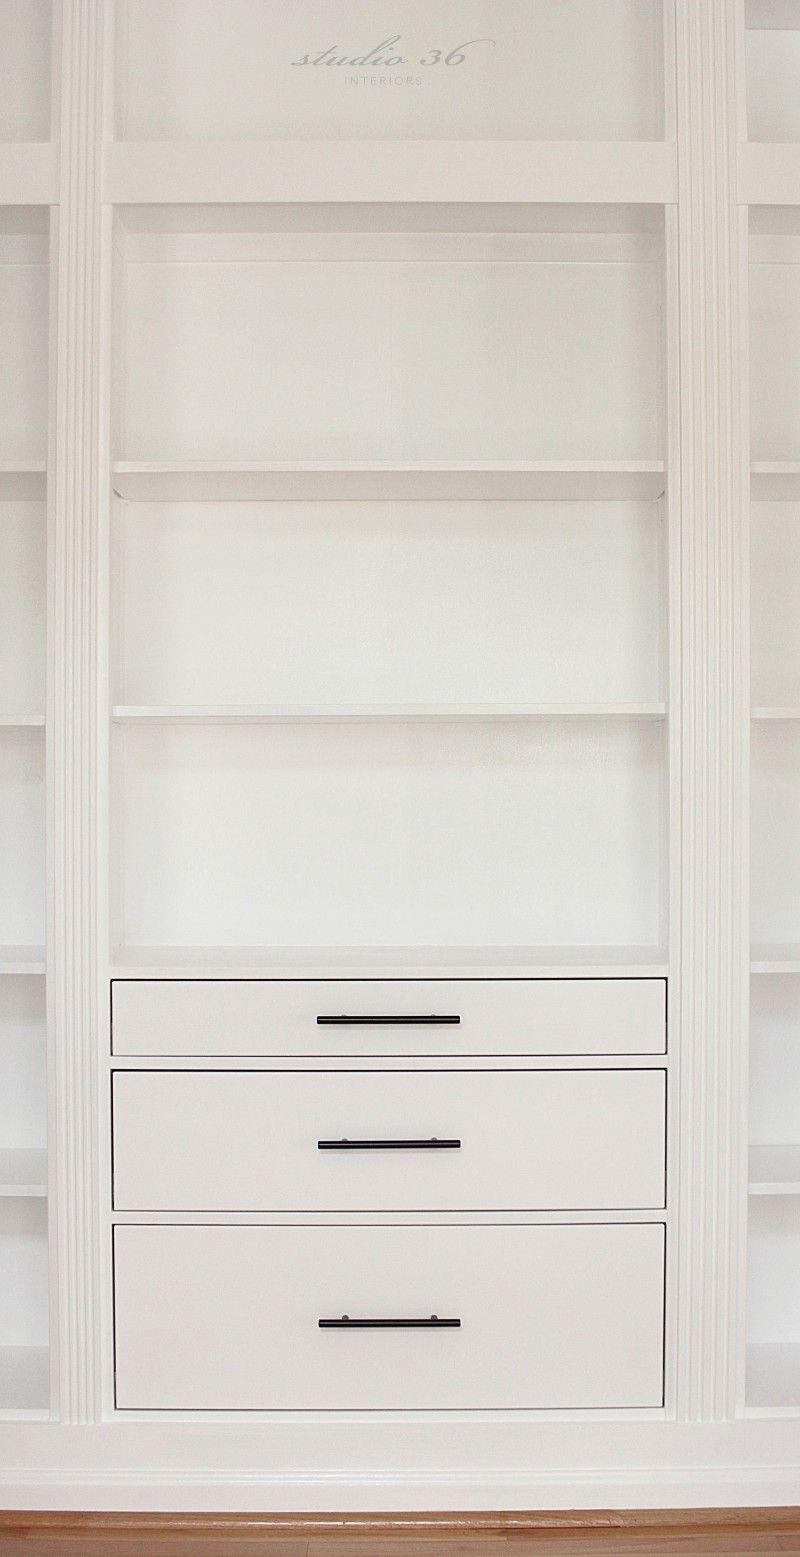 DIY BUILTIN BOOKCASE REVEAL (AN IKEA HACK) Ikea closet